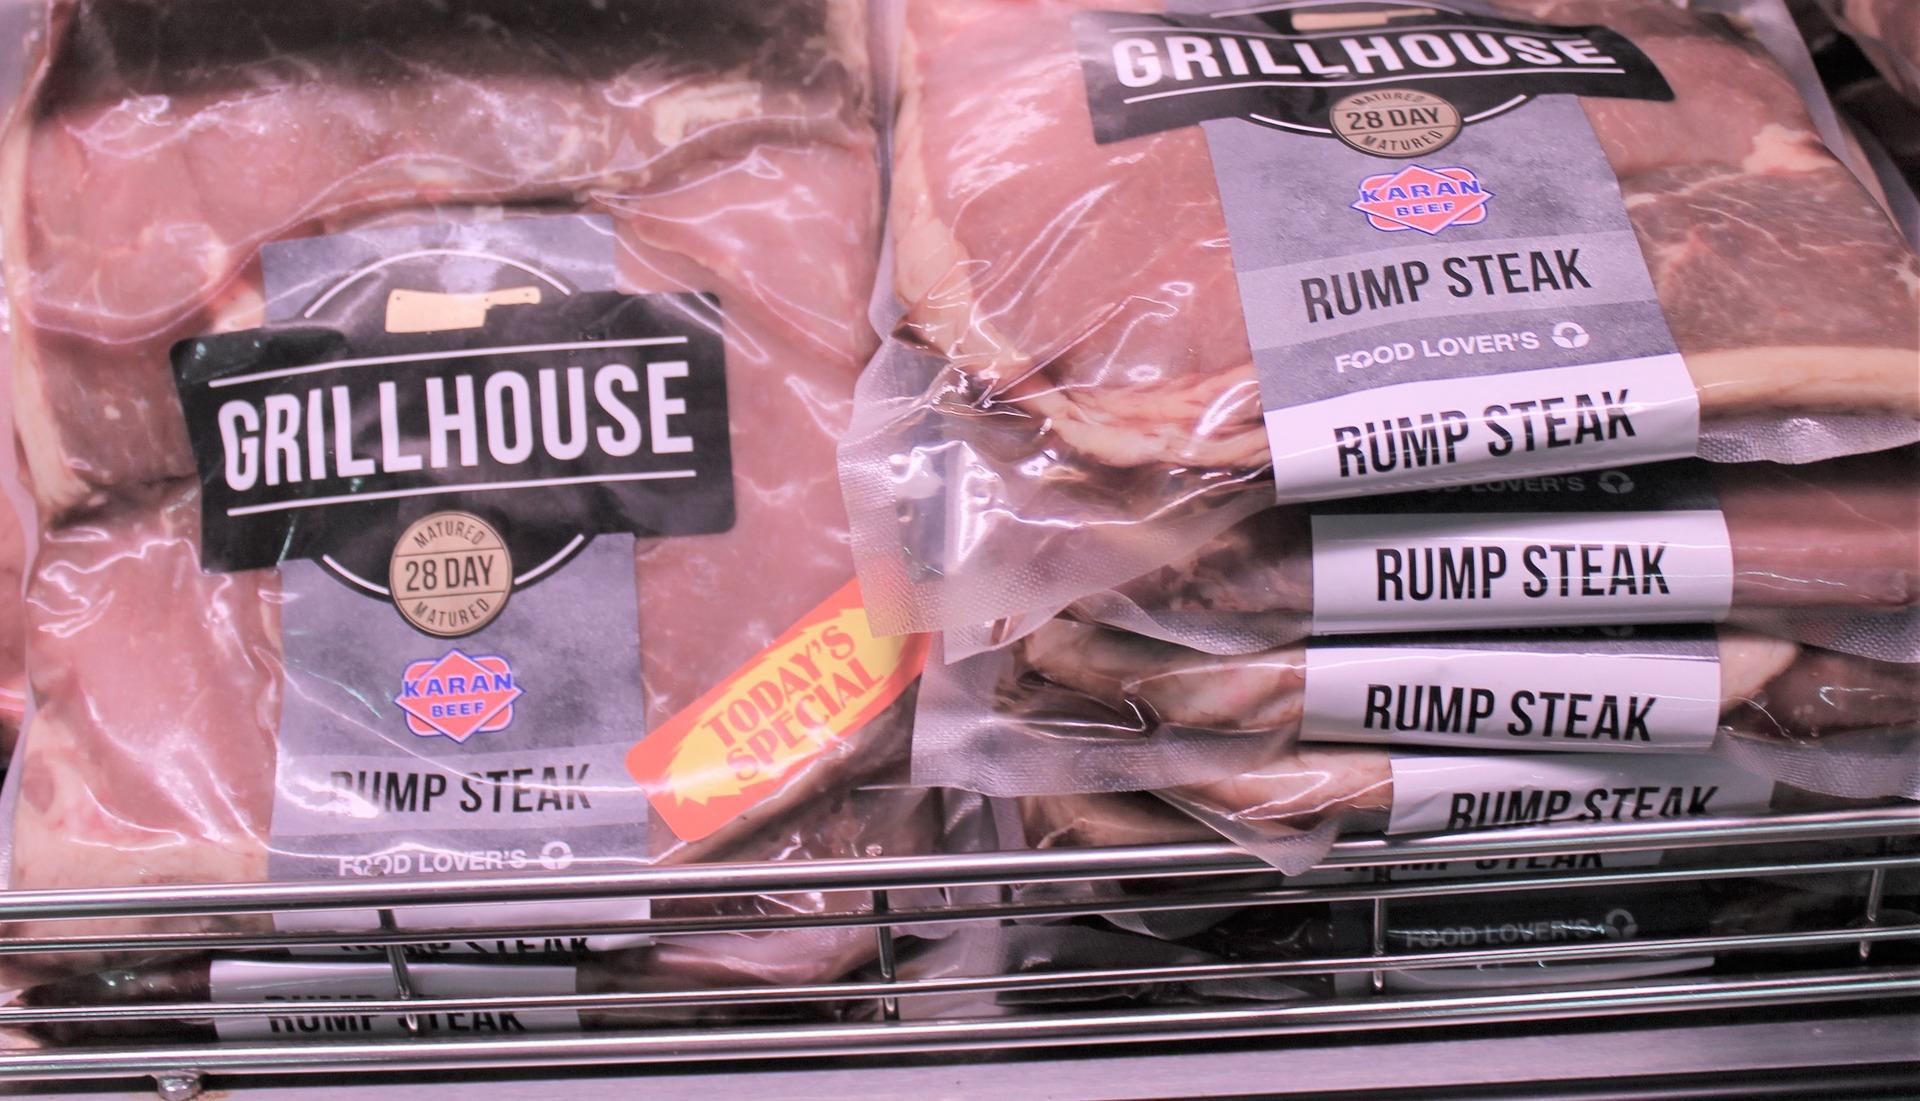 Sirloin/Rump Steak